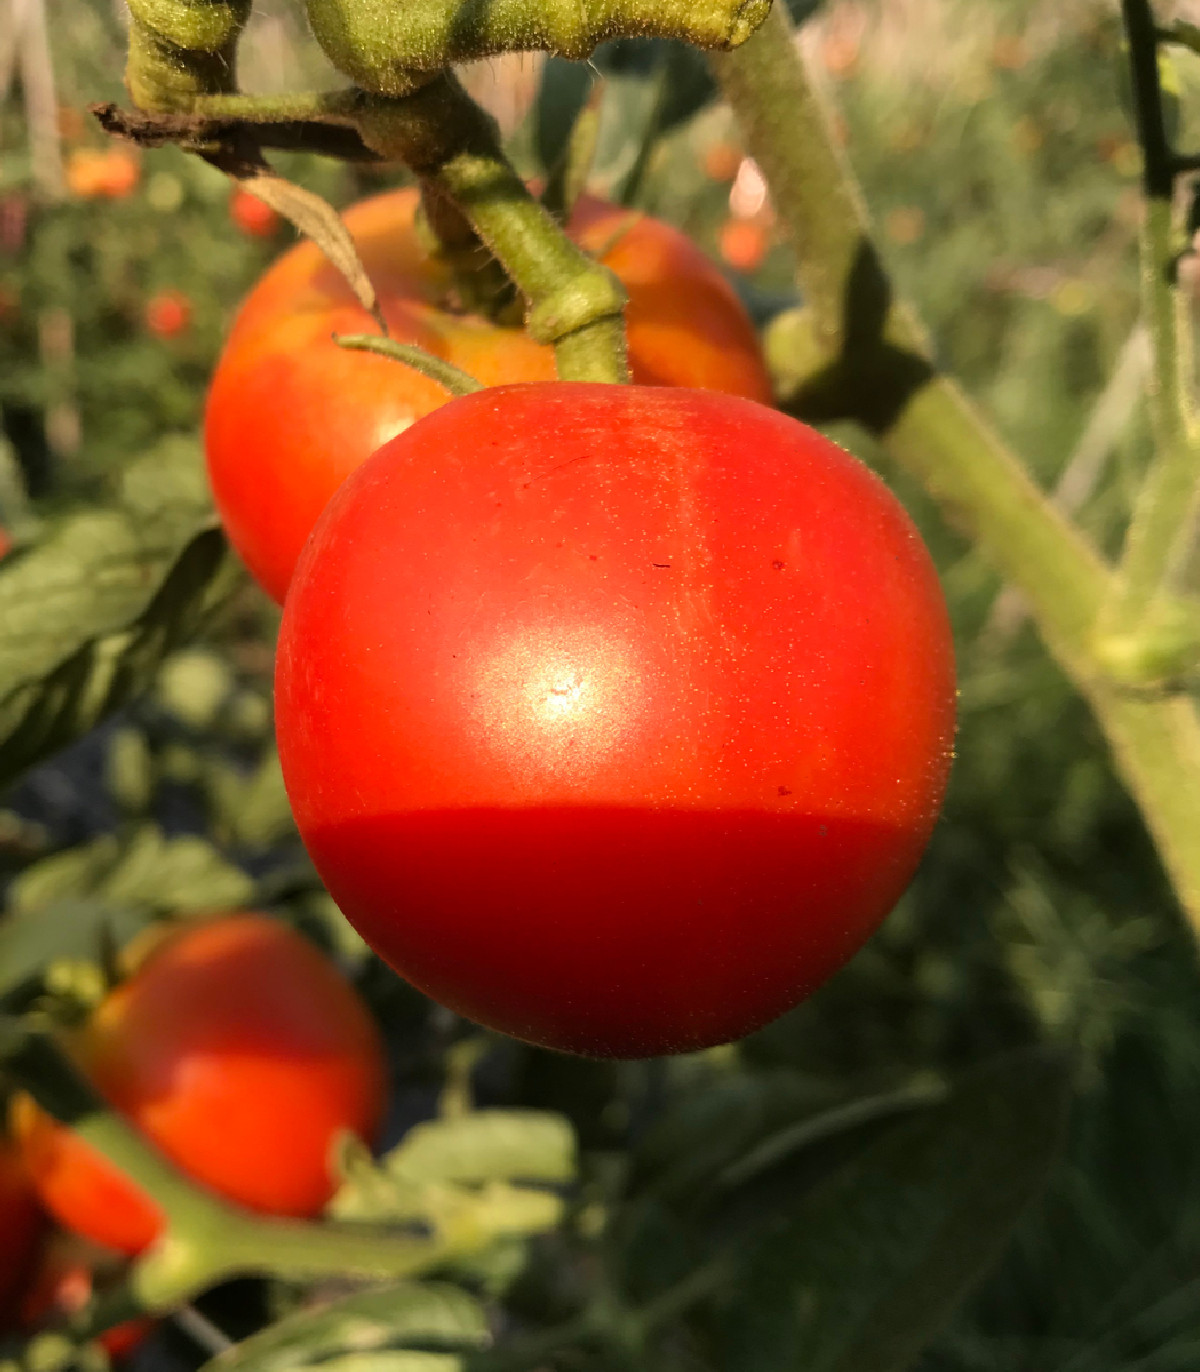 Paradajka kolíková F1 Harzfeuer - semená paradajky - semiačka - 6 ks